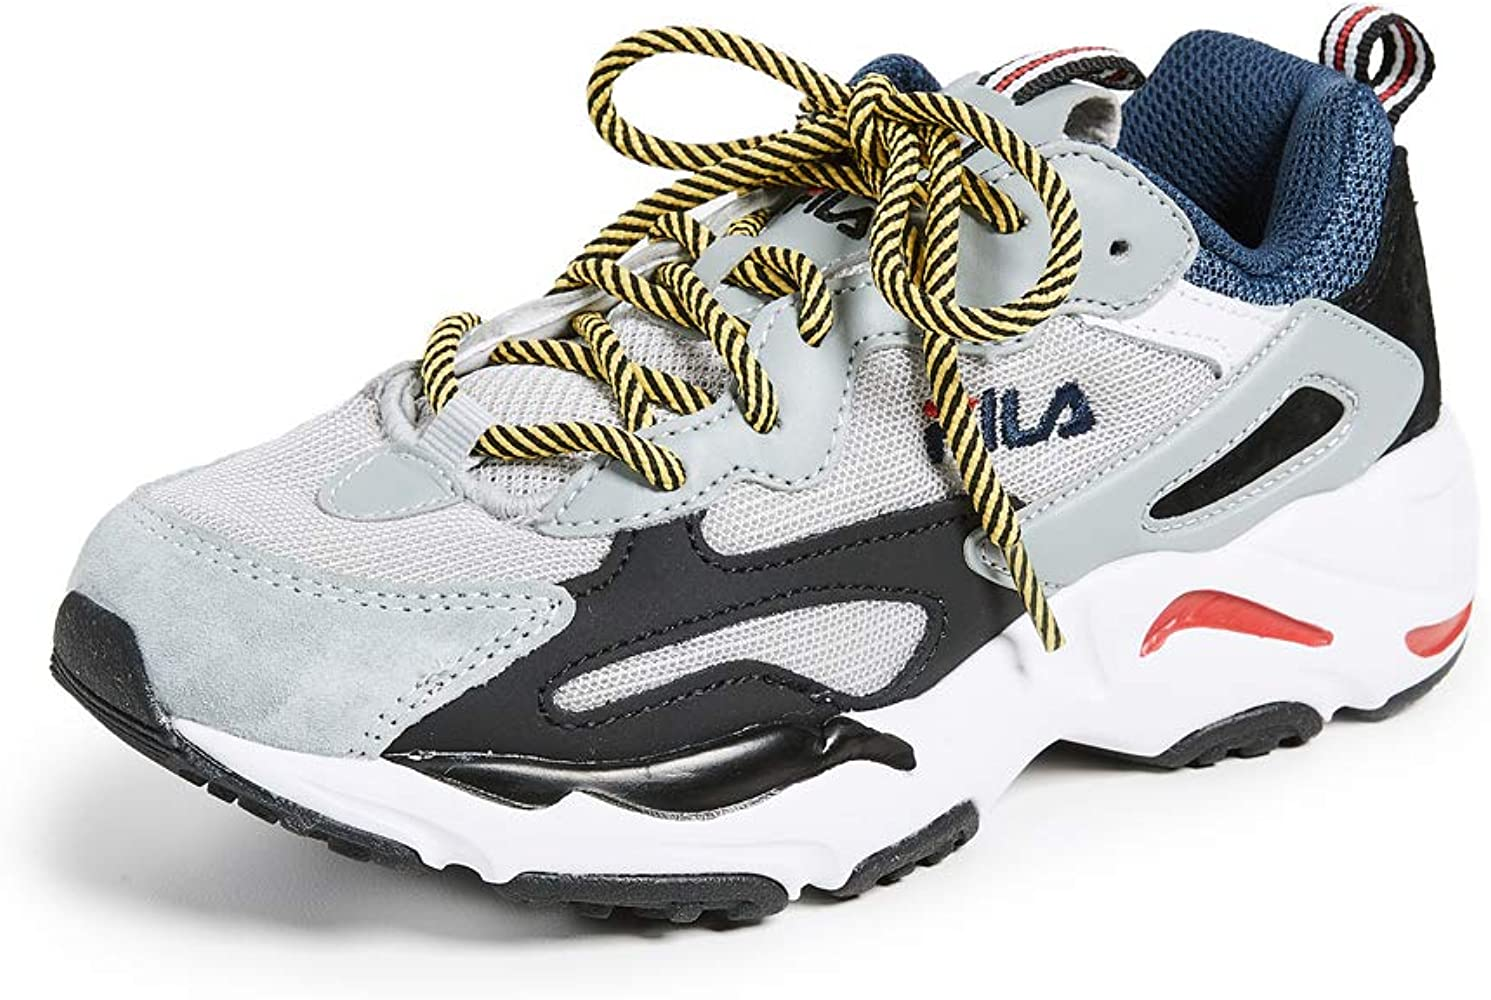 Fila Ray Tracer Damen Sneakers, Blau (Blau/Weiß/Schwarz), 6.5 M EU ...